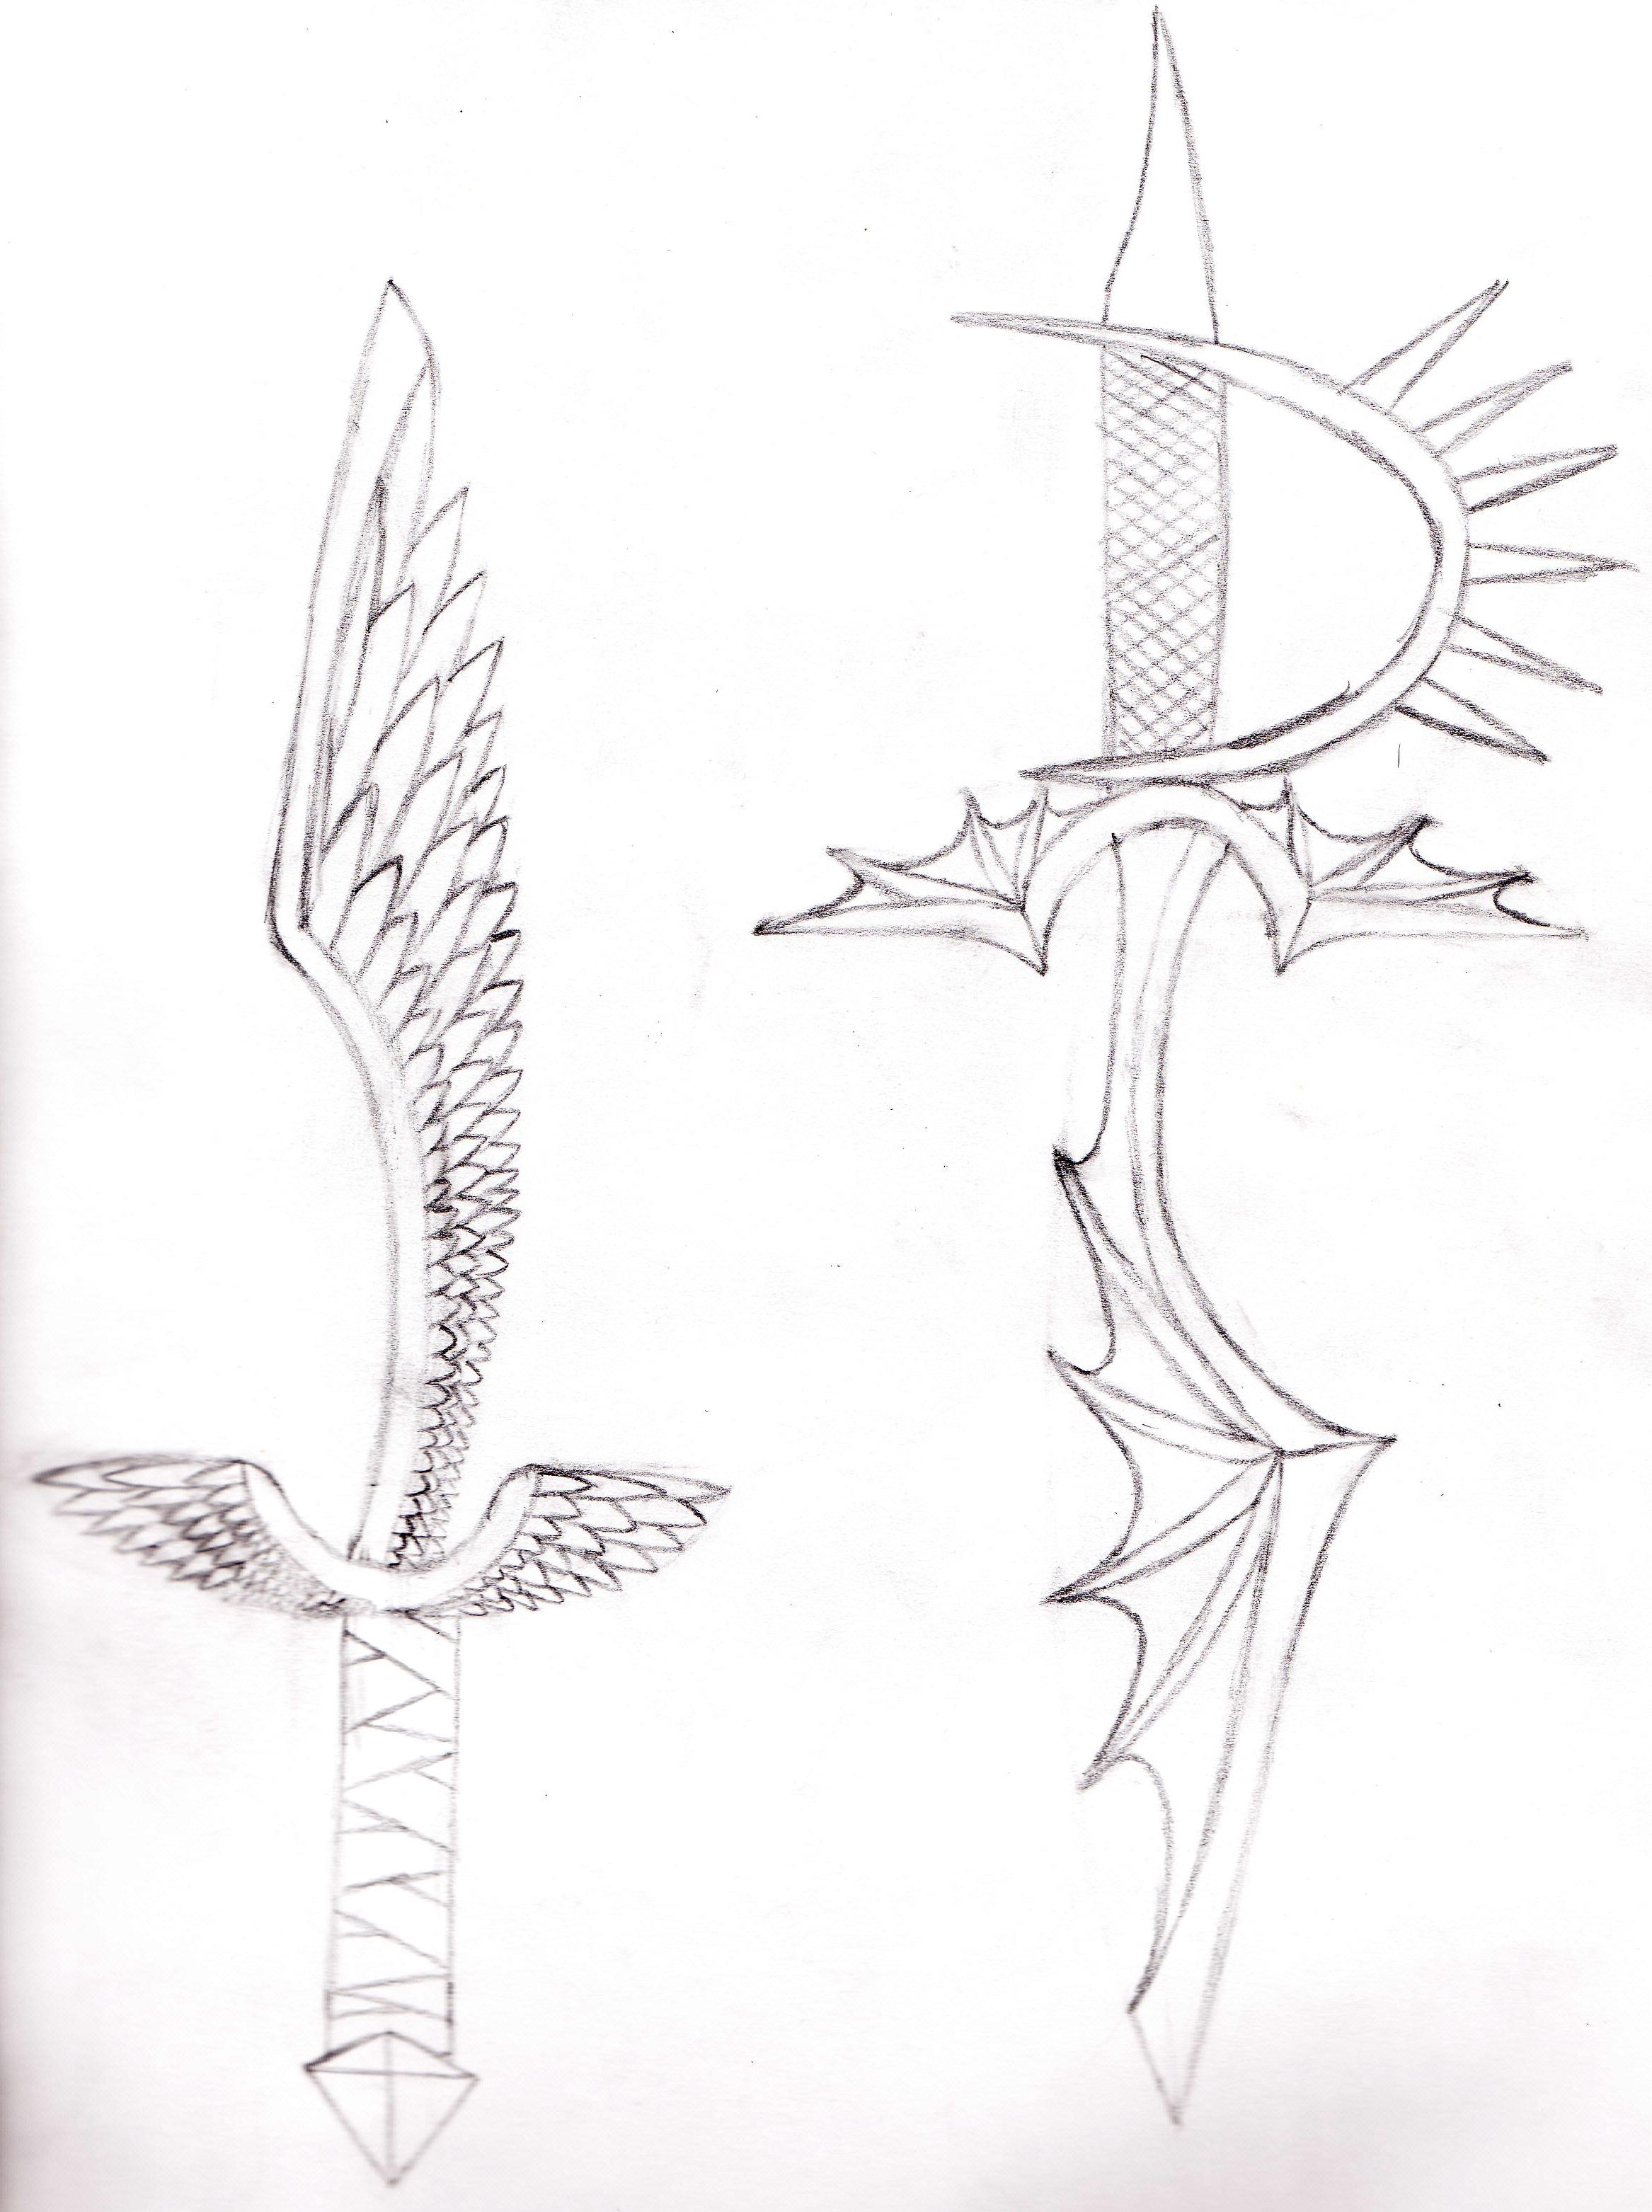 Drawn angel sword drawing #8